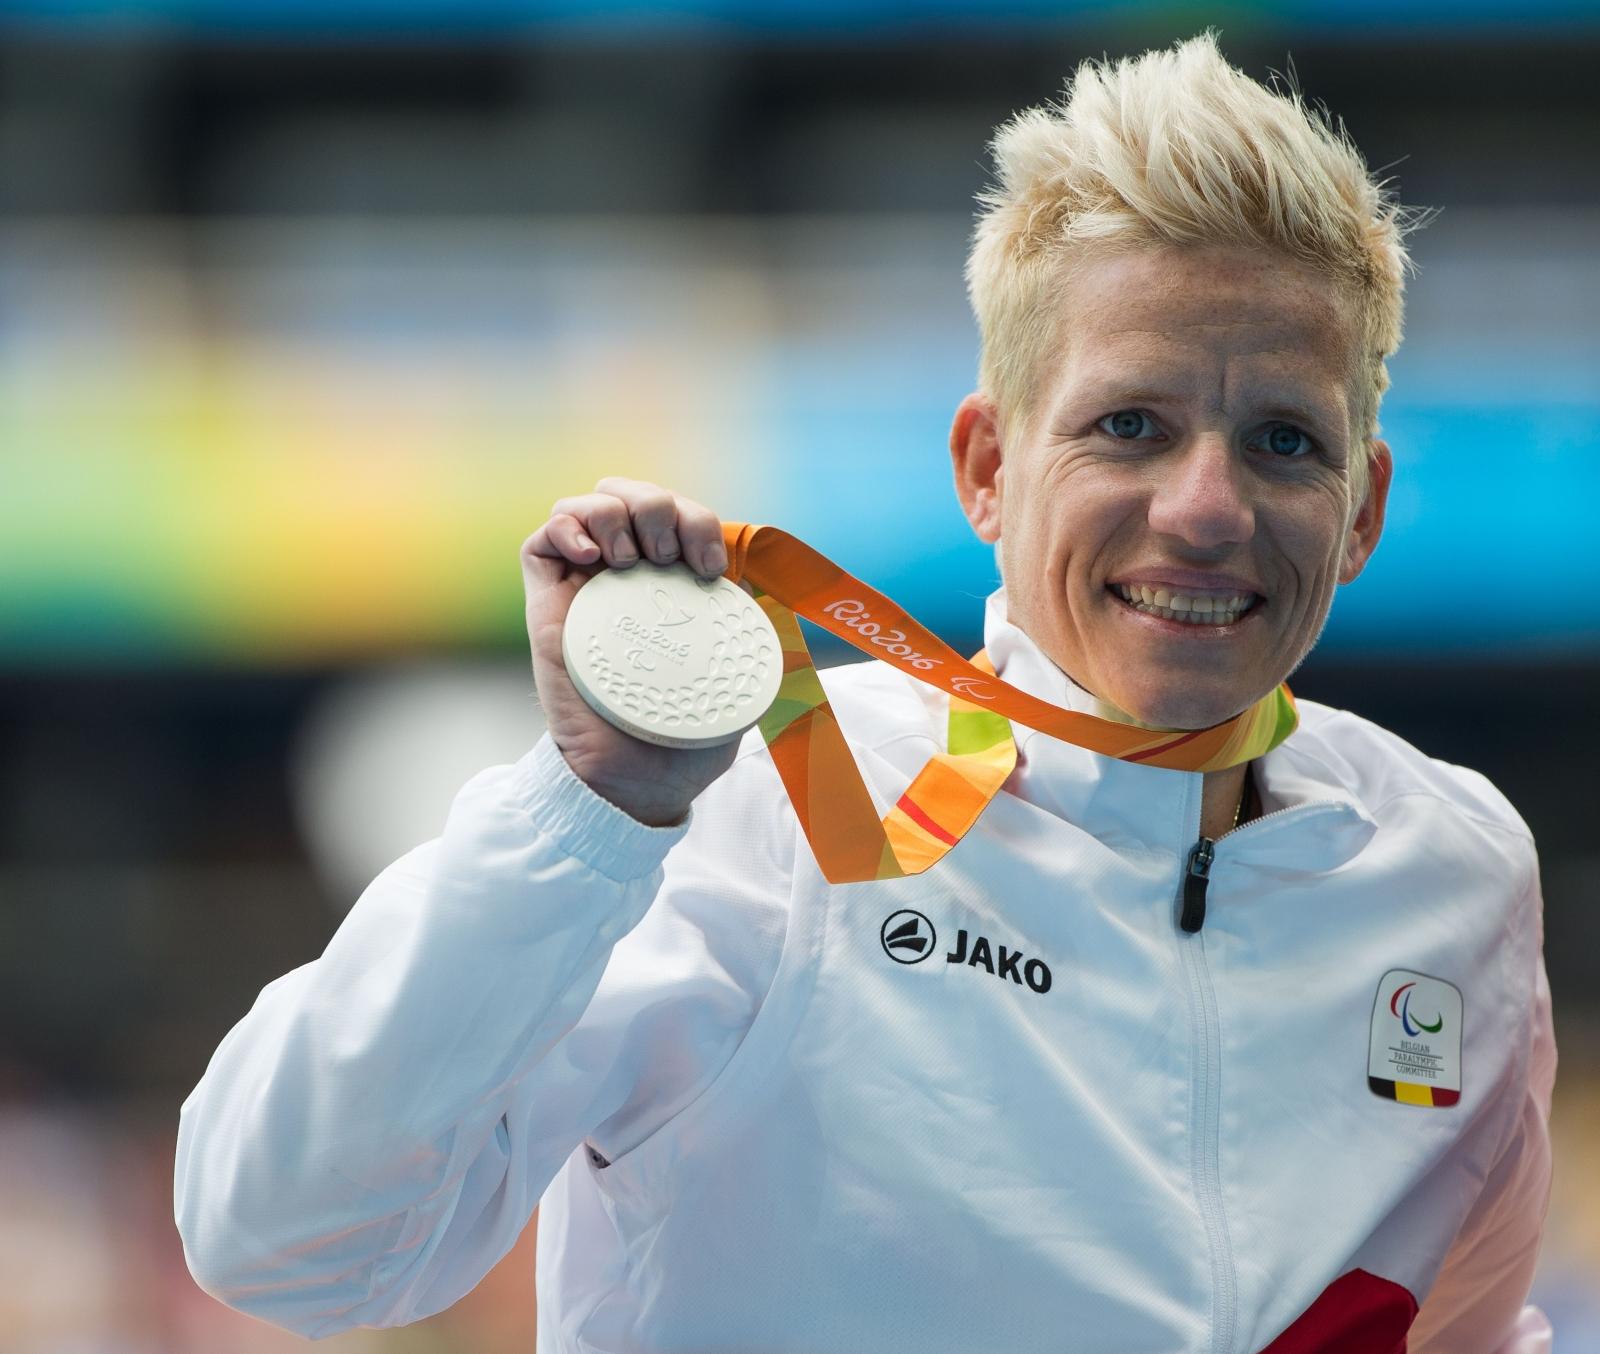 rio 2016 belgian paralympian marieke vervoort wants to be